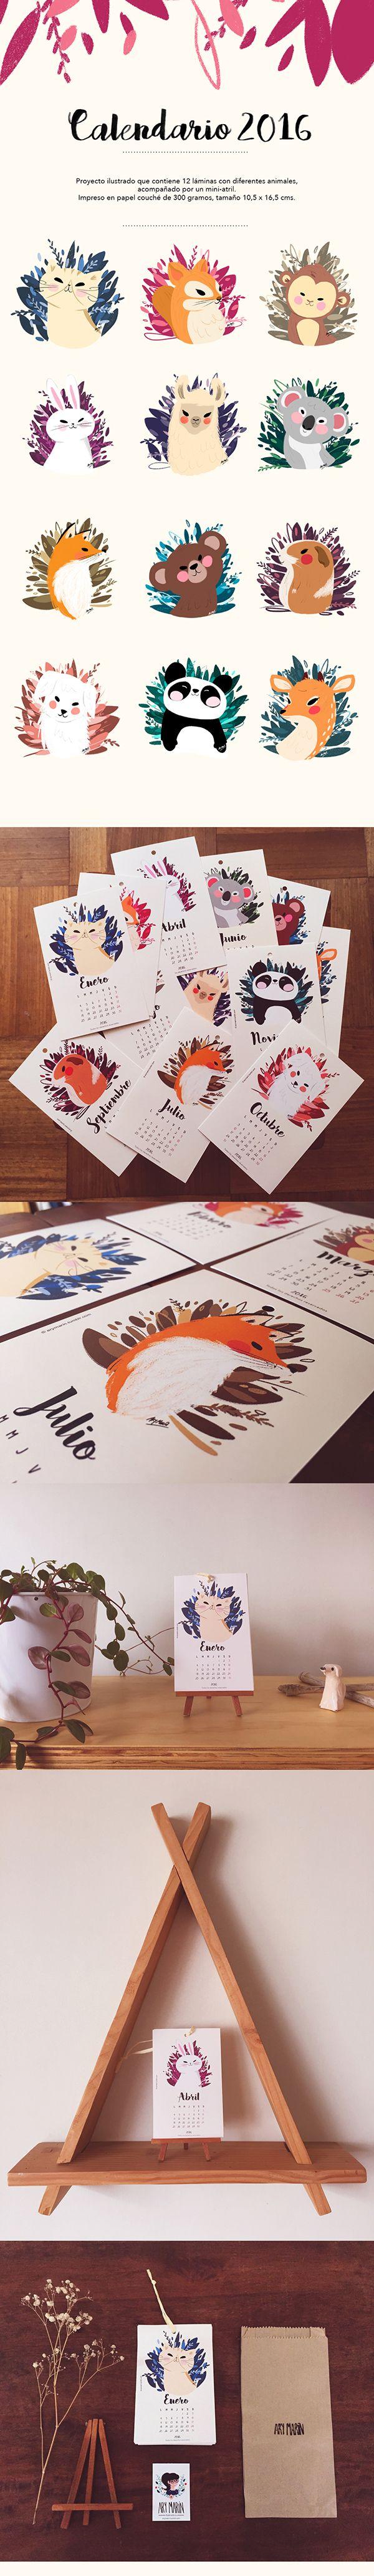 Calendario Ilustrado 2016 - форма рисунка - не круг, но завершенная